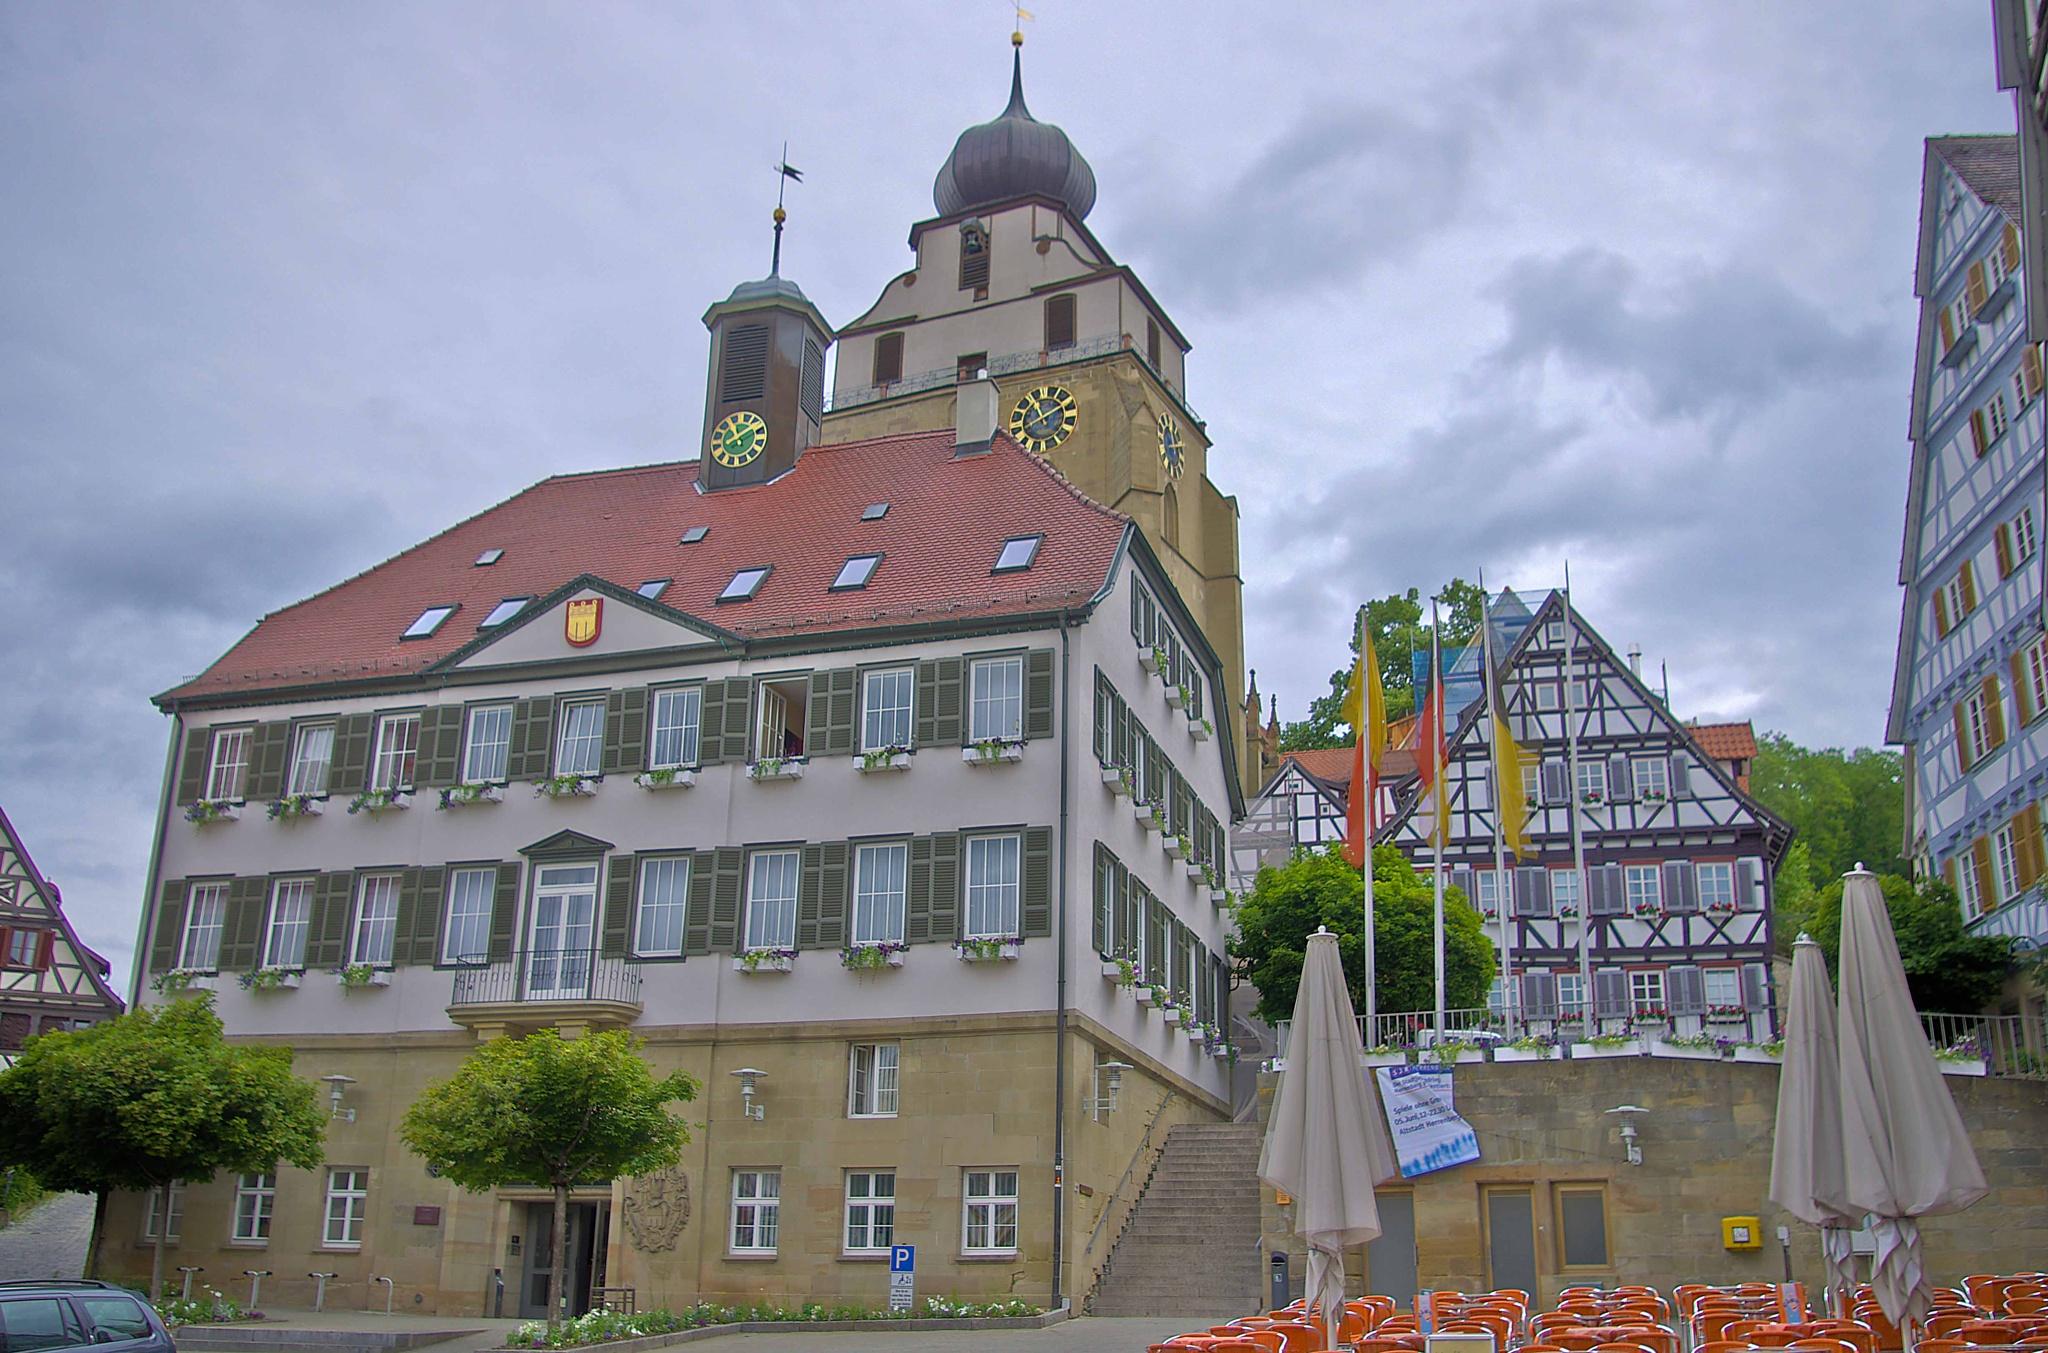 City Hall Herrenberg by Peter Blaha